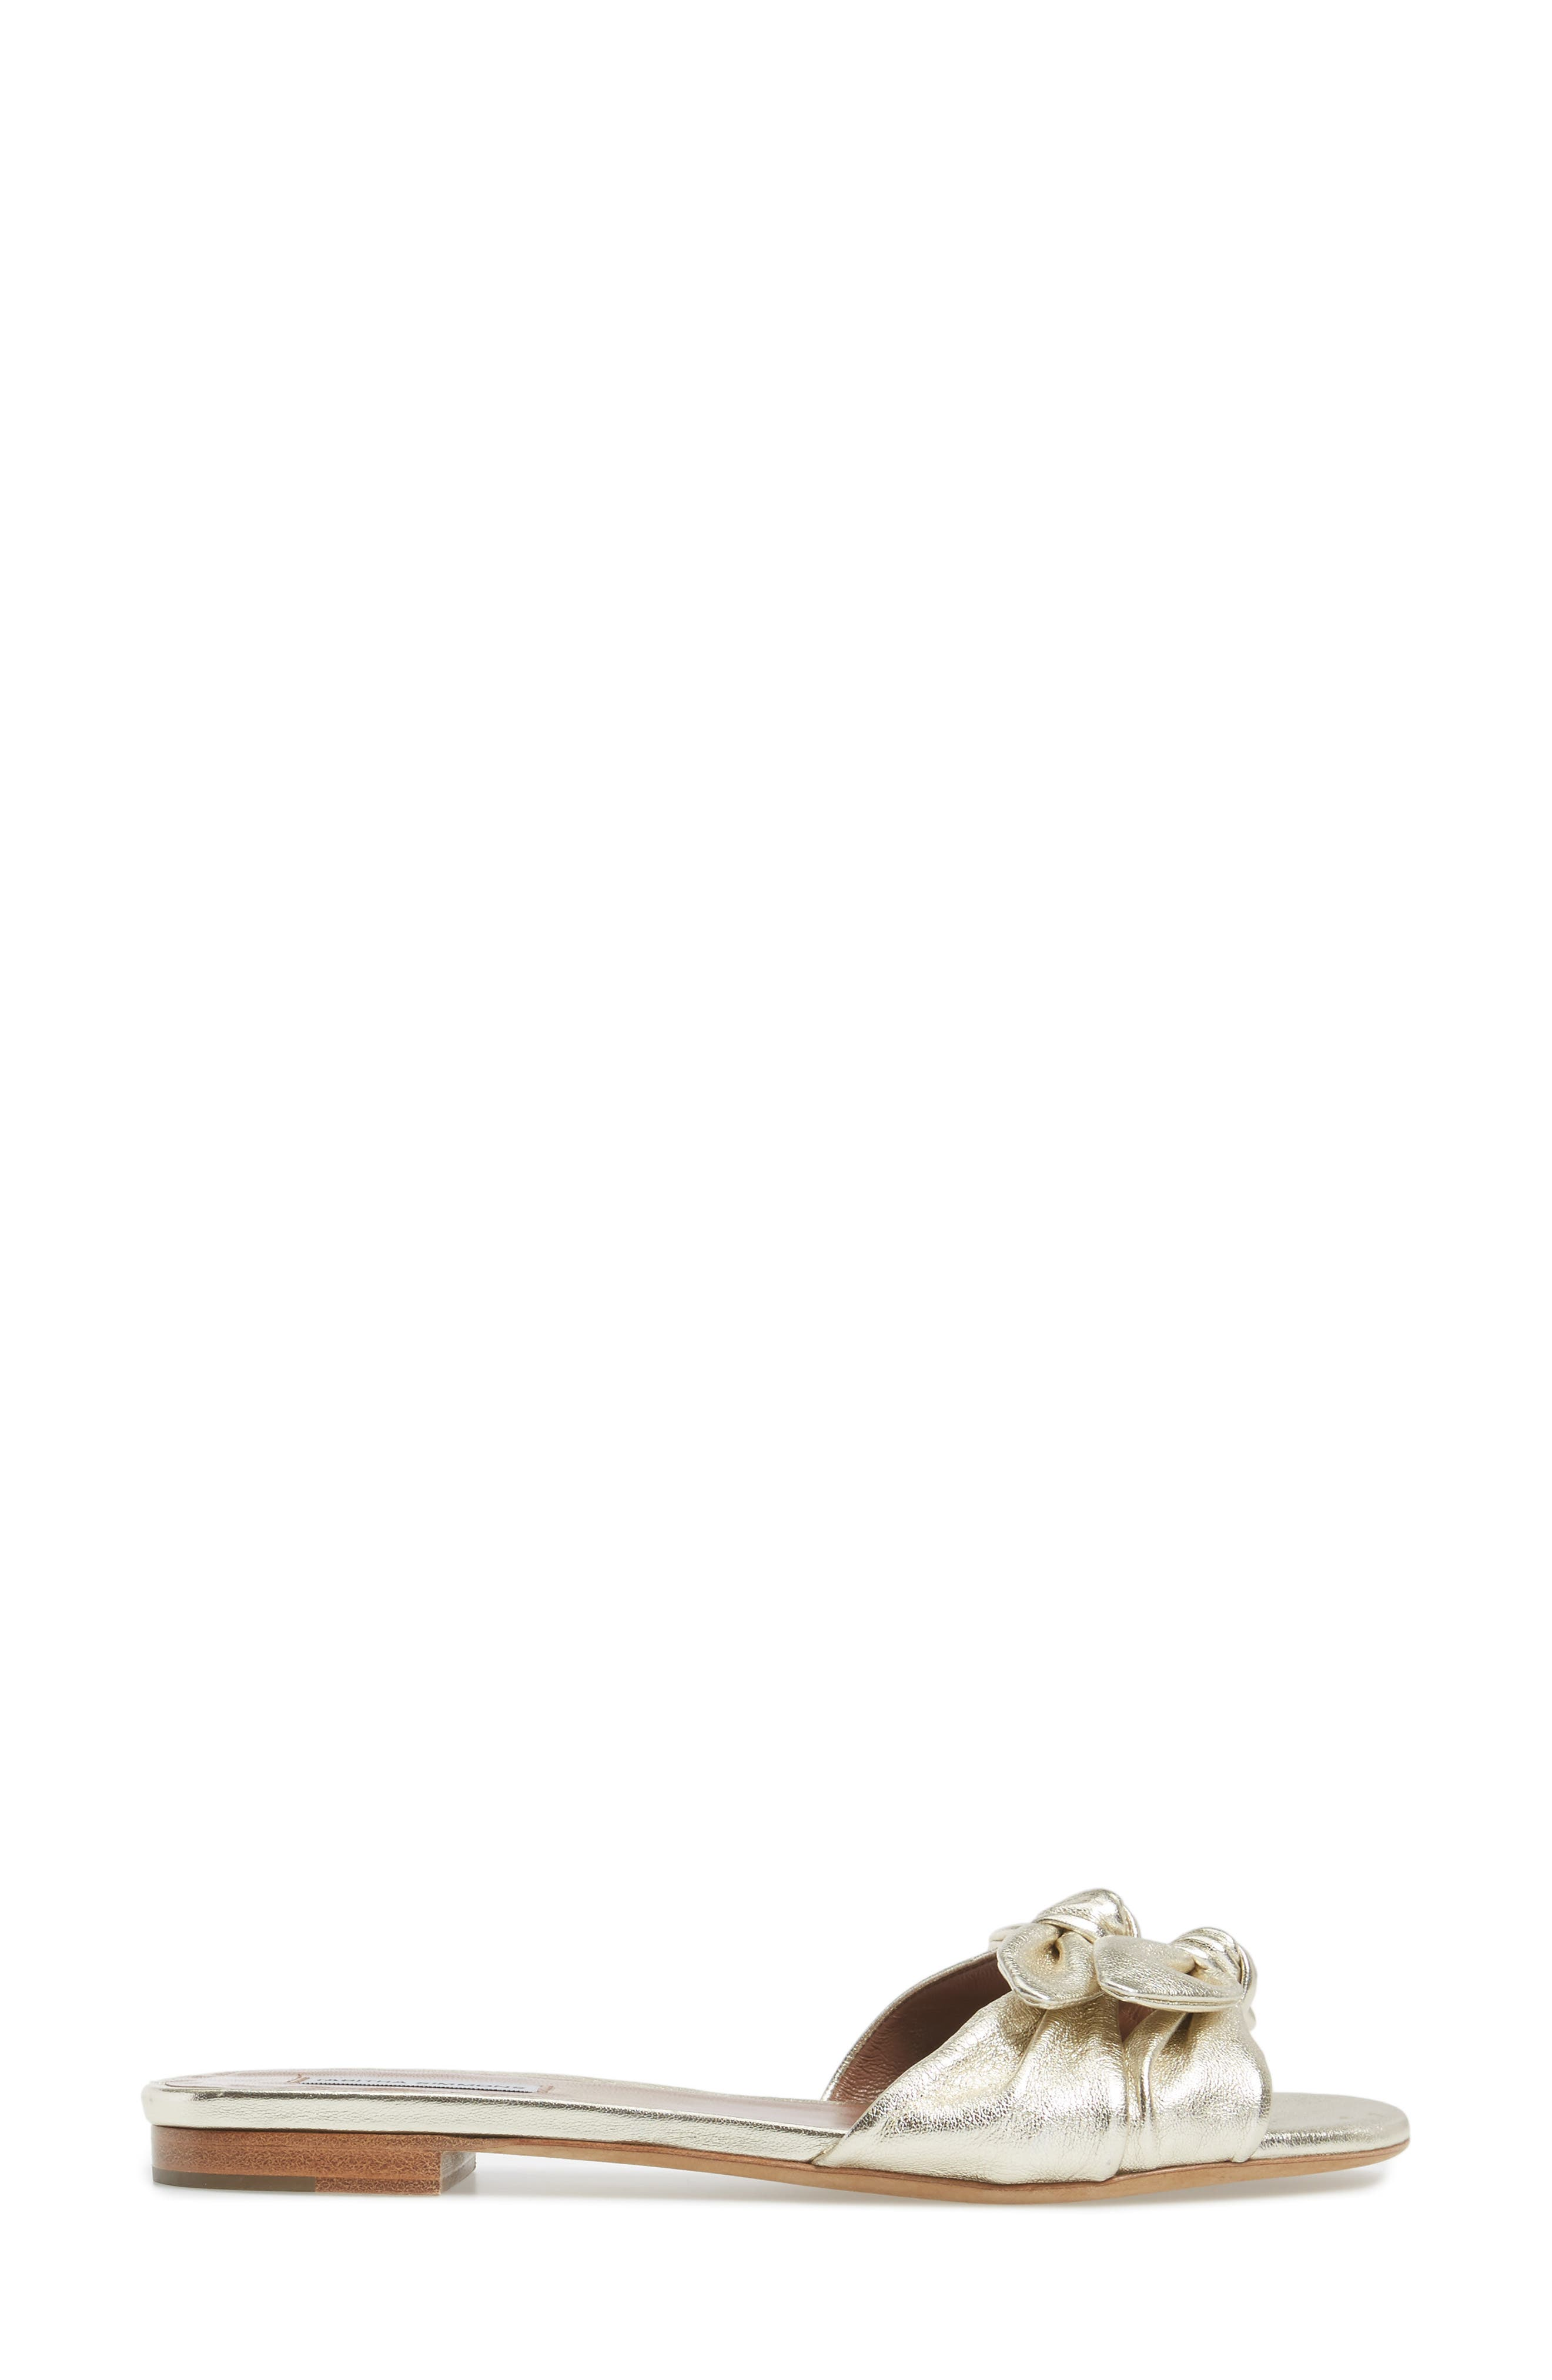 Cleo Knotted Bow Slide Sandal,                             Alternate thumbnail 3, color,                             040